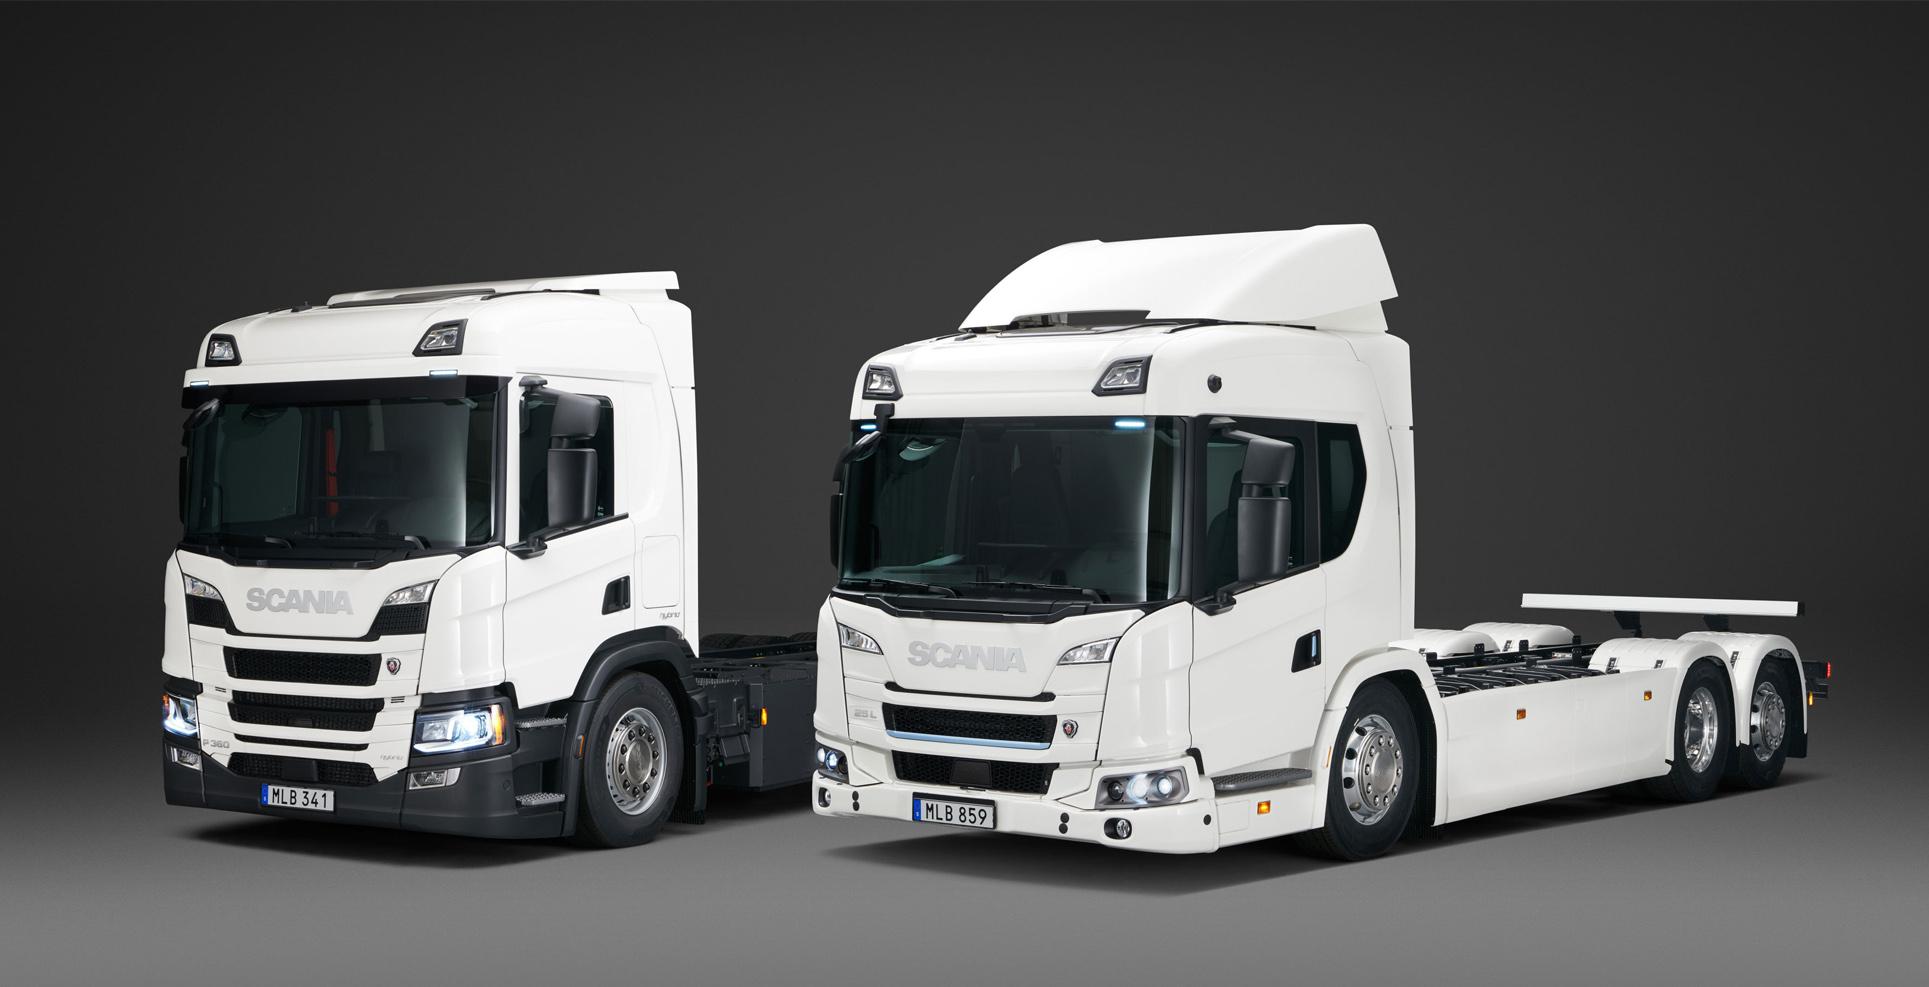 Scania electric, plug-in hybrid rigid trucks L P Series